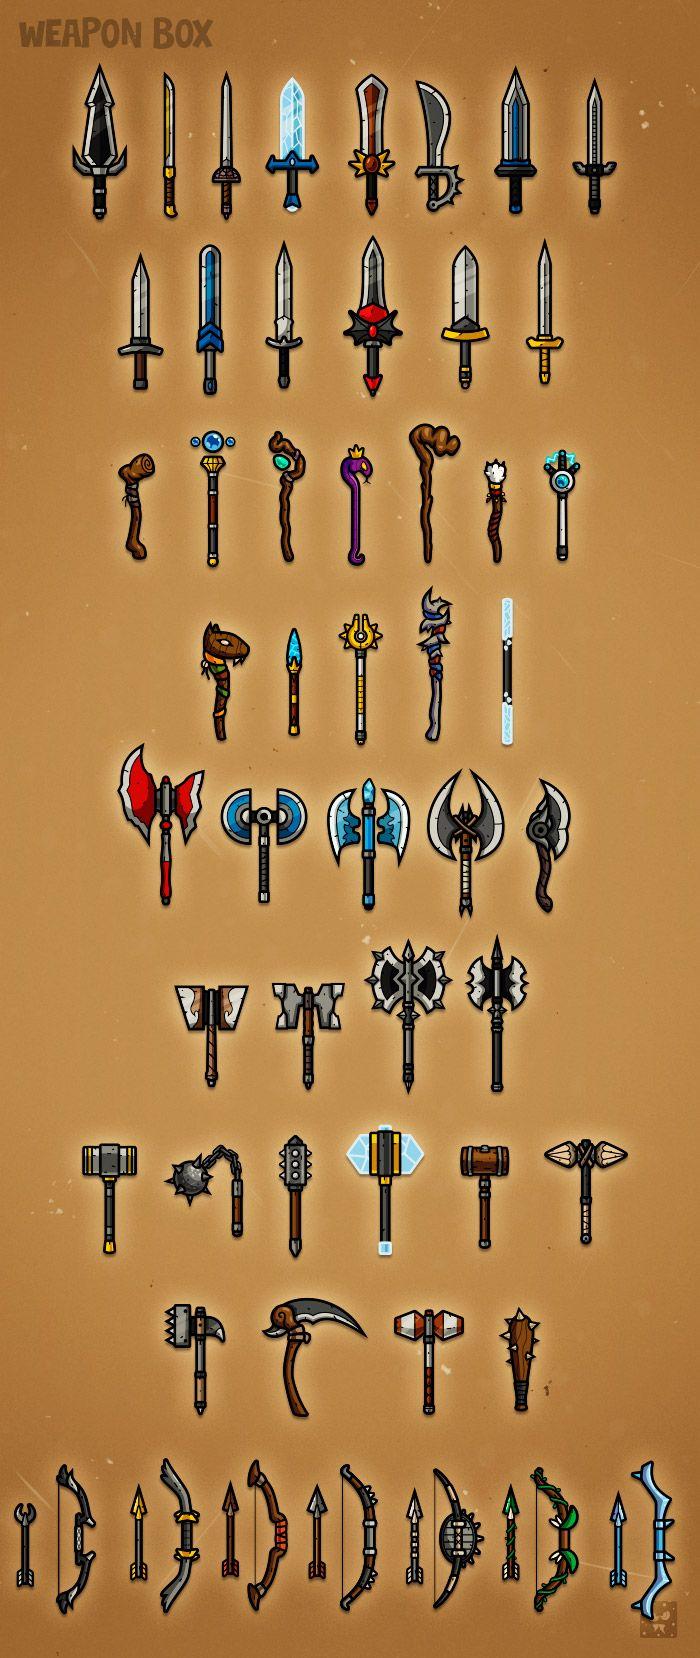 Weapon Box 1 - weapon designs for RPG class #EatCreatures #DanielFerencak…